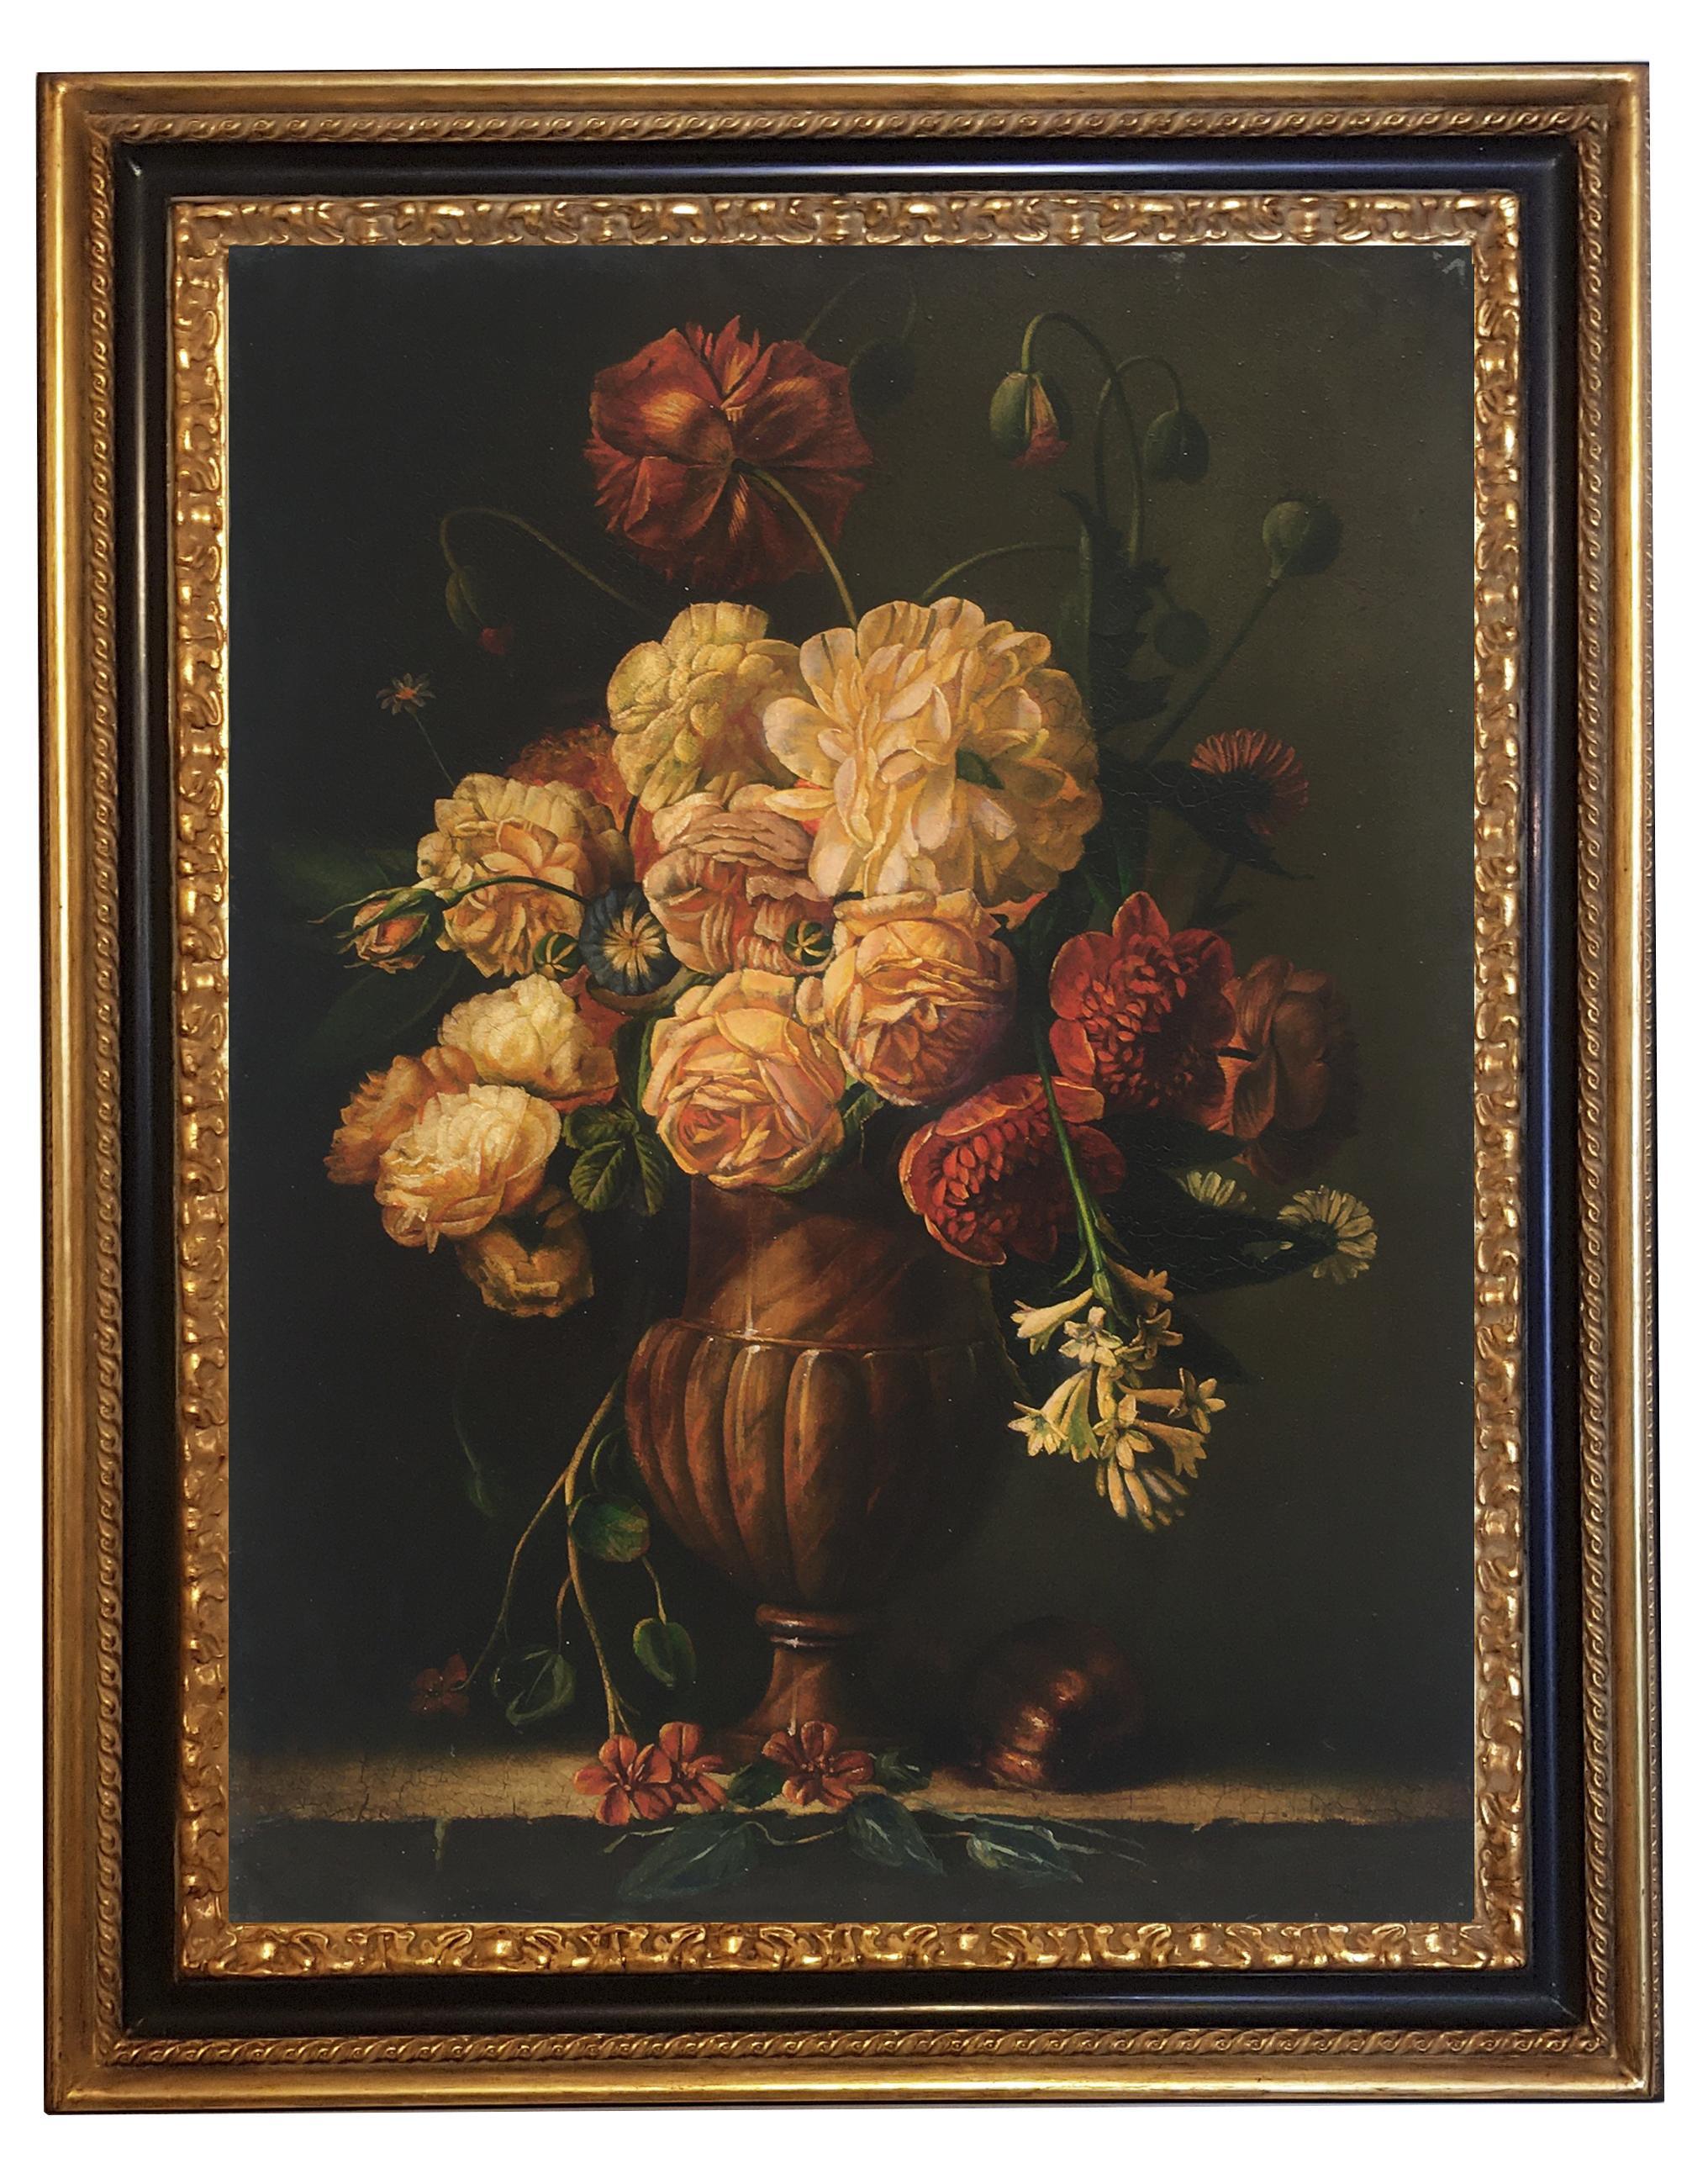 FLOWERS - In the Manner of Mario Dei Fiori - Oil On Canvas Italian Painting